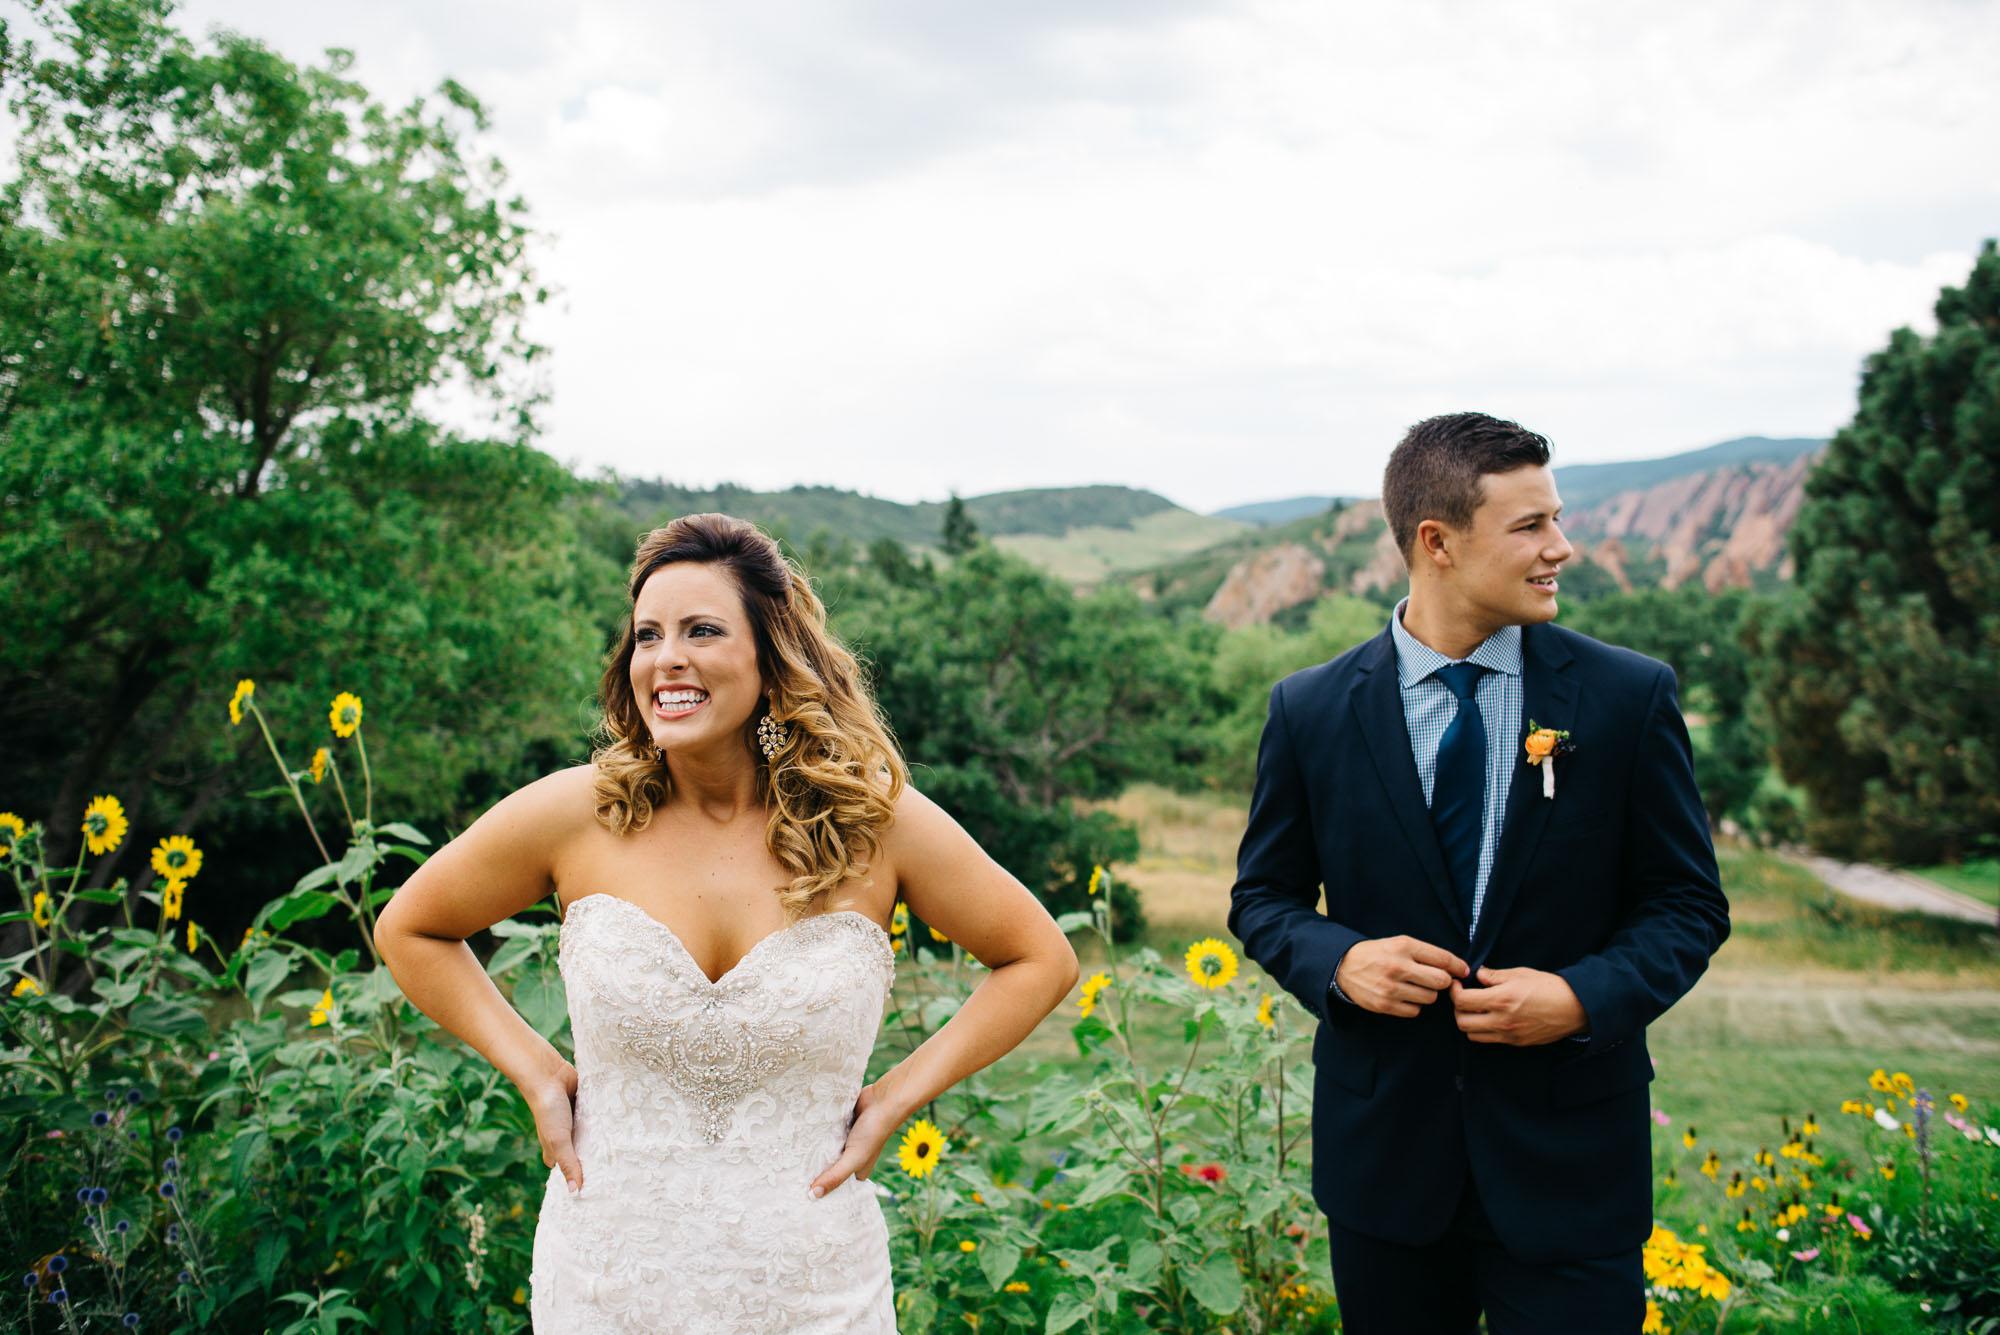 122elopement-photographer-colorado-arrowhead-wedding-jordan&jace-2057.jpg